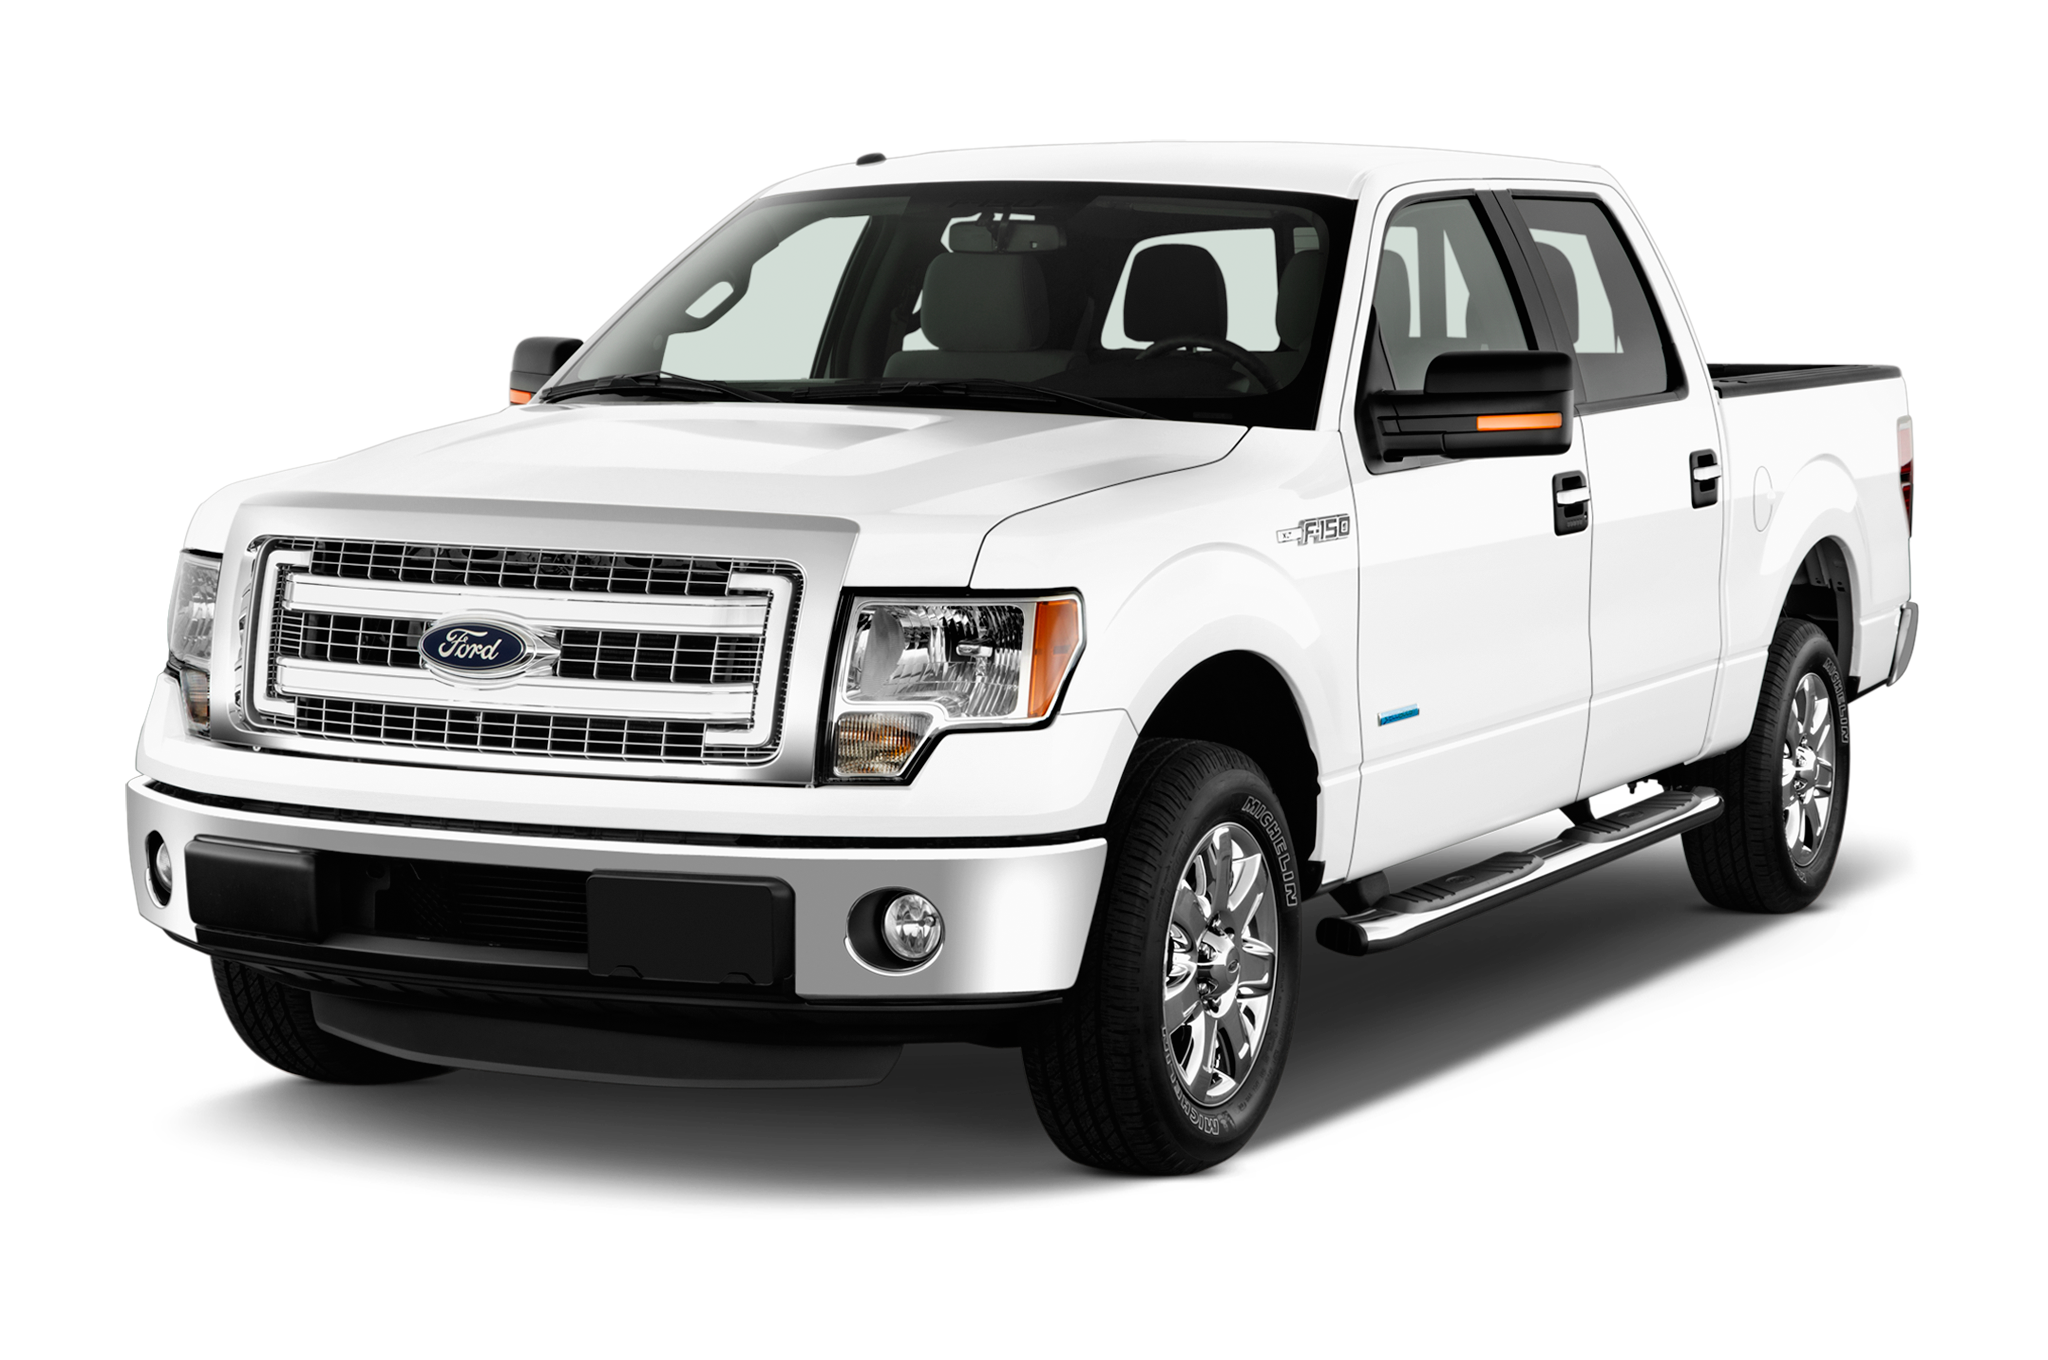 2014 ford f 250 truck autos post. Black Bedroom Furniture Sets. Home Design Ideas